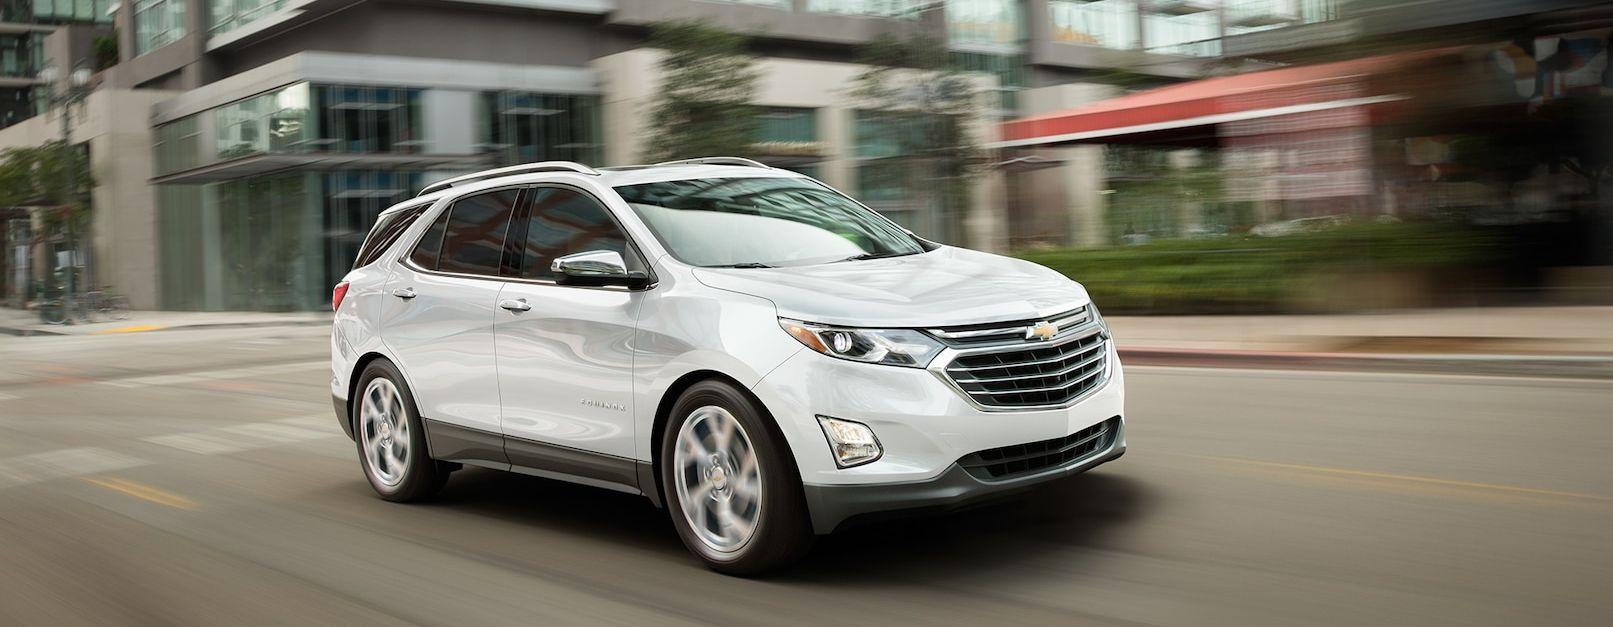 2019 Chevrolet Equinox Financing in Jackson, MI